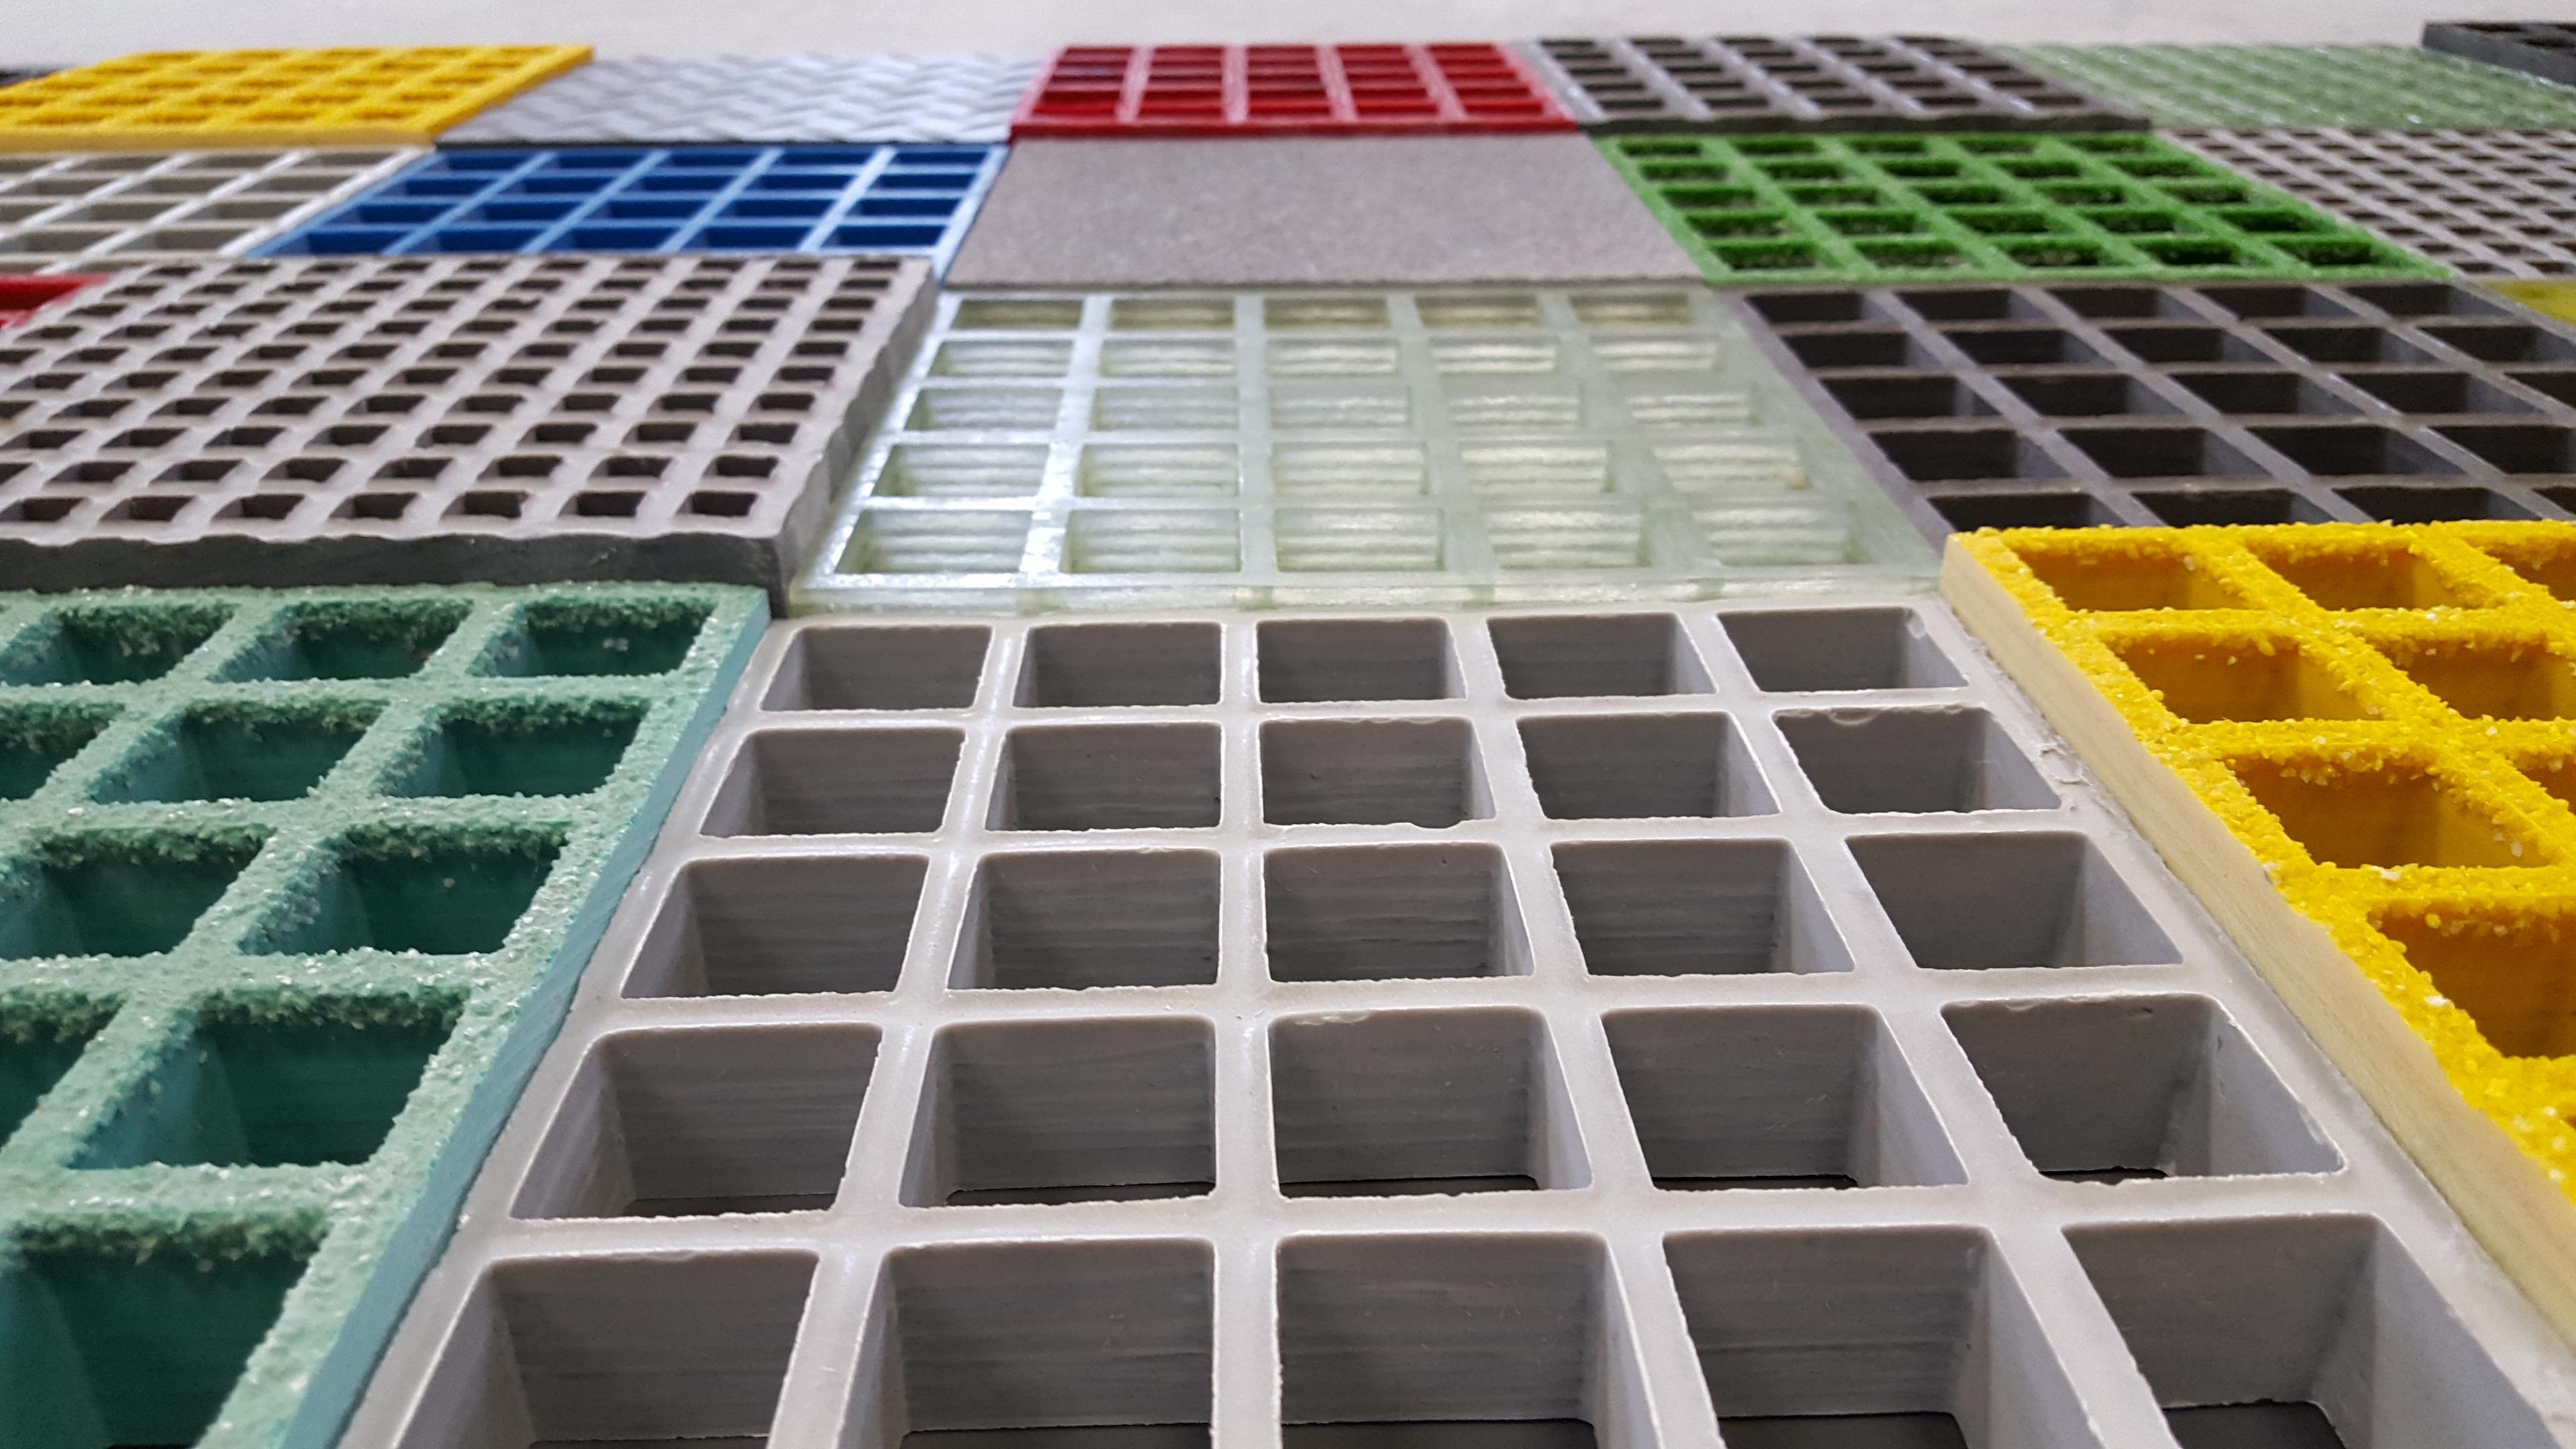 profile caillebotis platelage composite profile caillebotis platelage prv profile. Black Bedroom Furniture Sets. Home Design Ideas